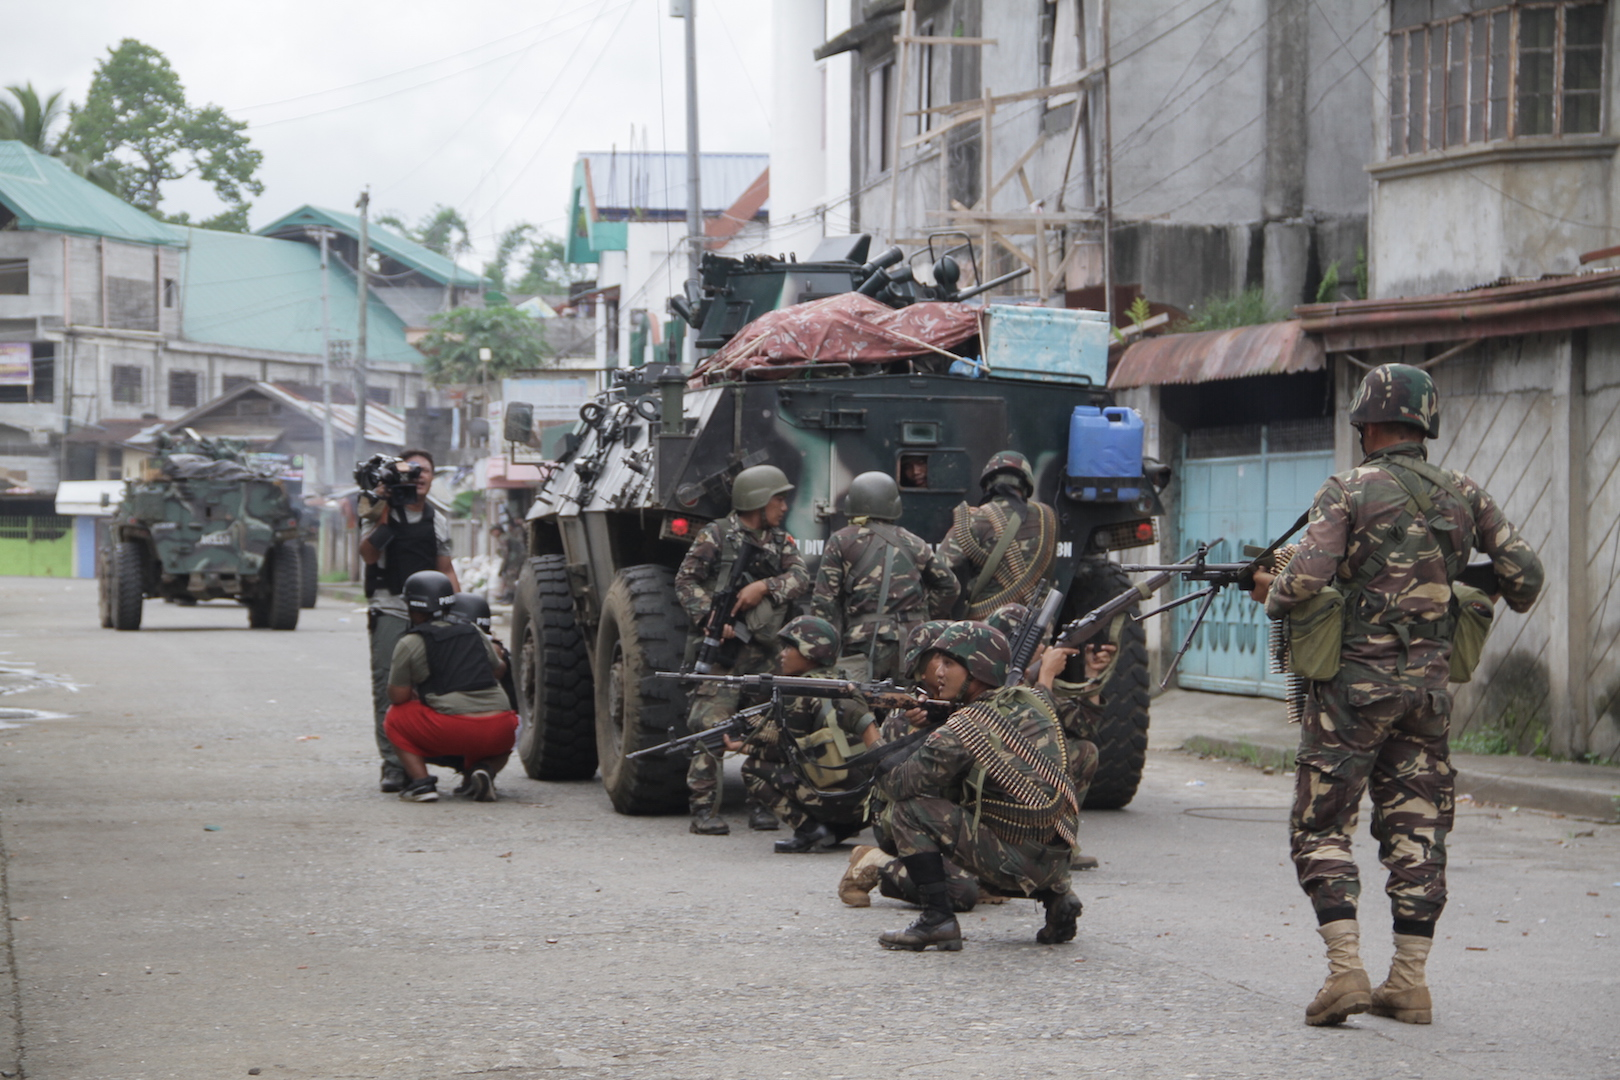 IRIN Inside Marawi Death toll nears 100 as Philippines